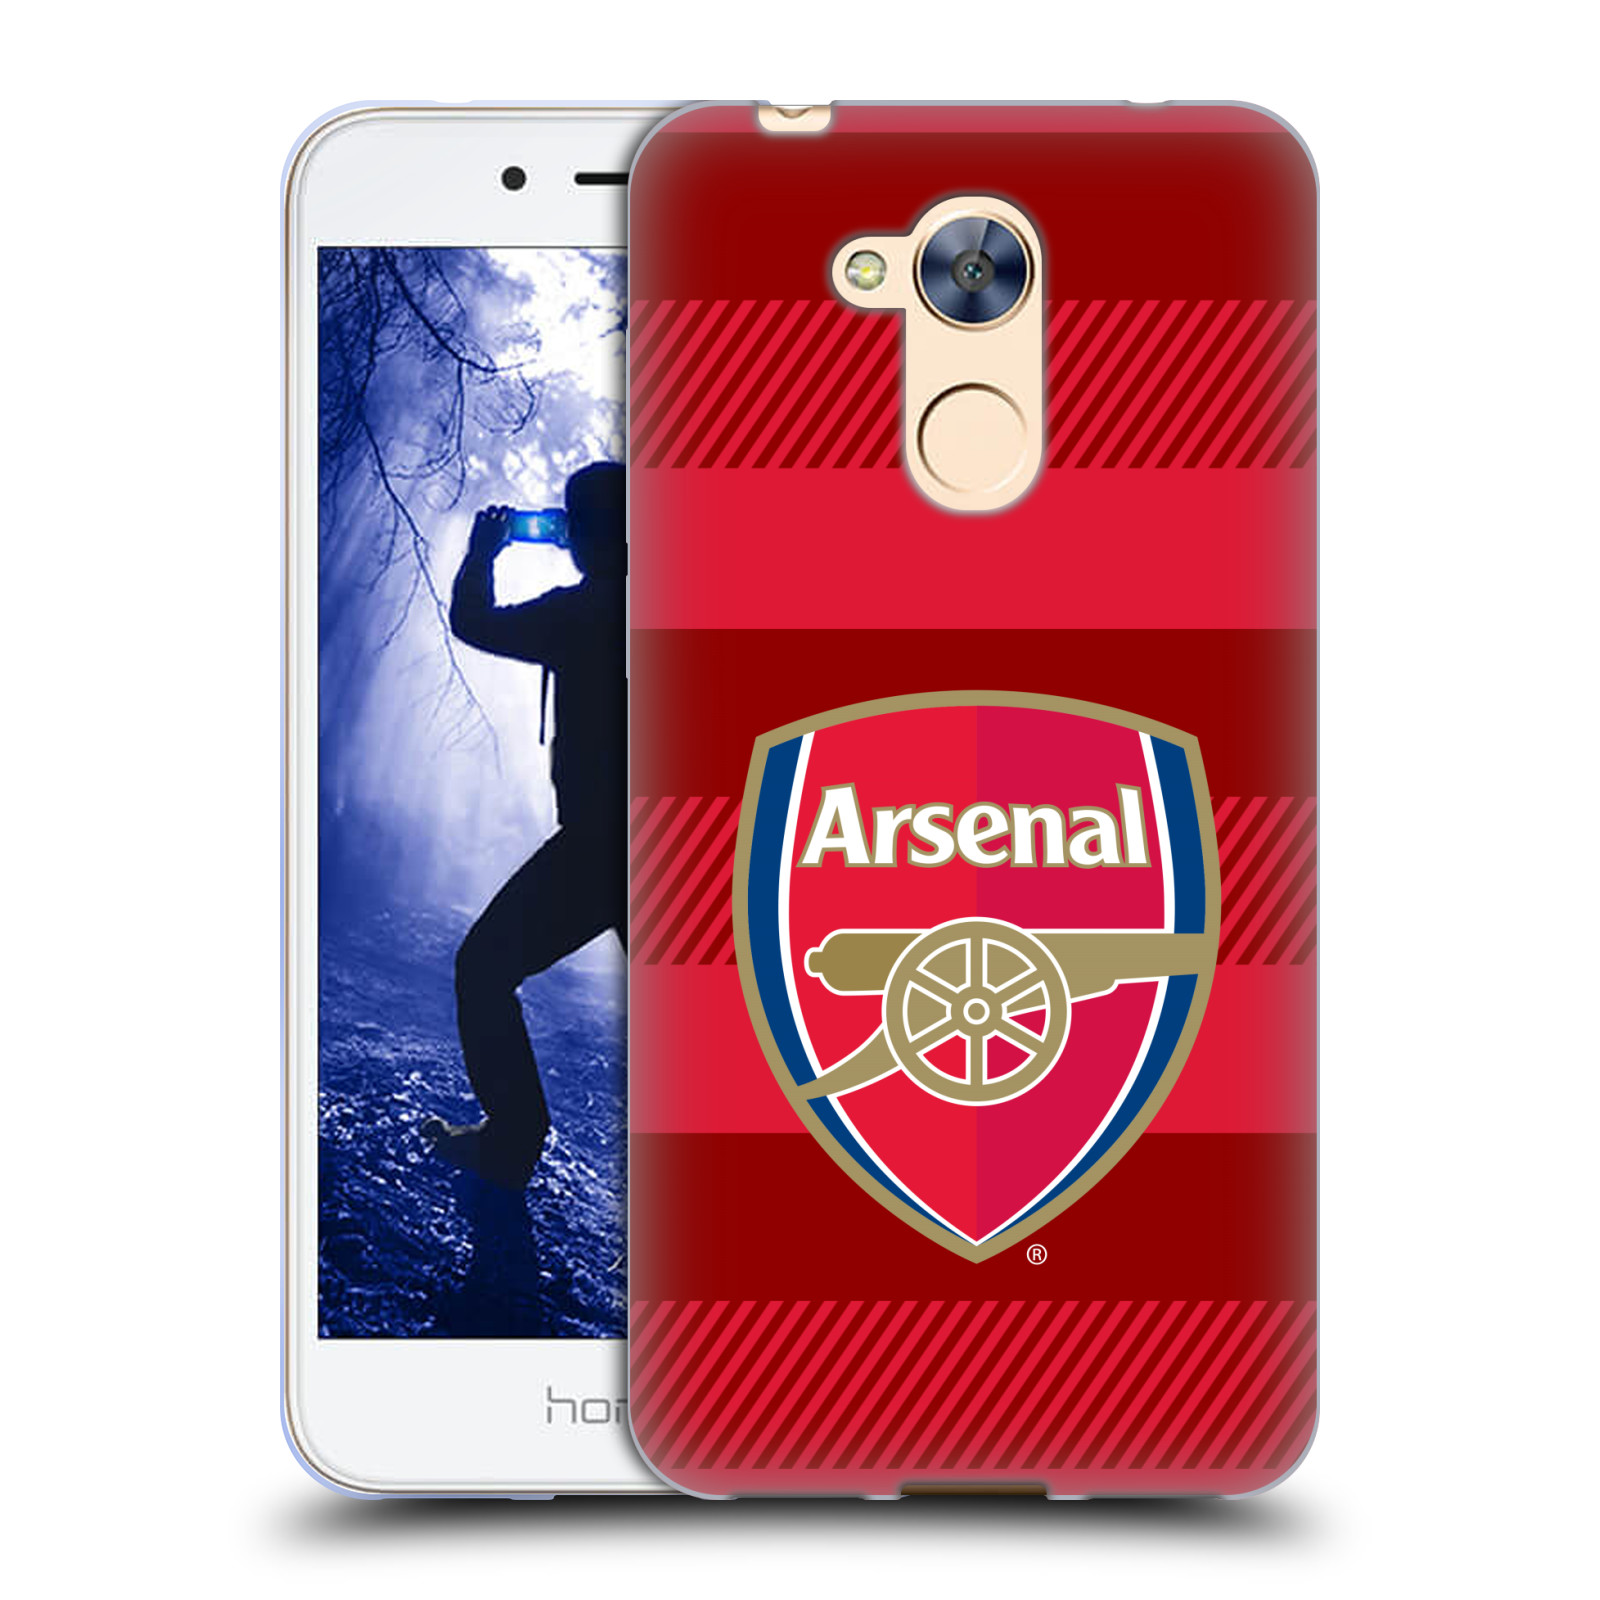 Silikonové pouzdro na mobil Honor 6A - Head Case - Arsenal FC - Logo s pruhy